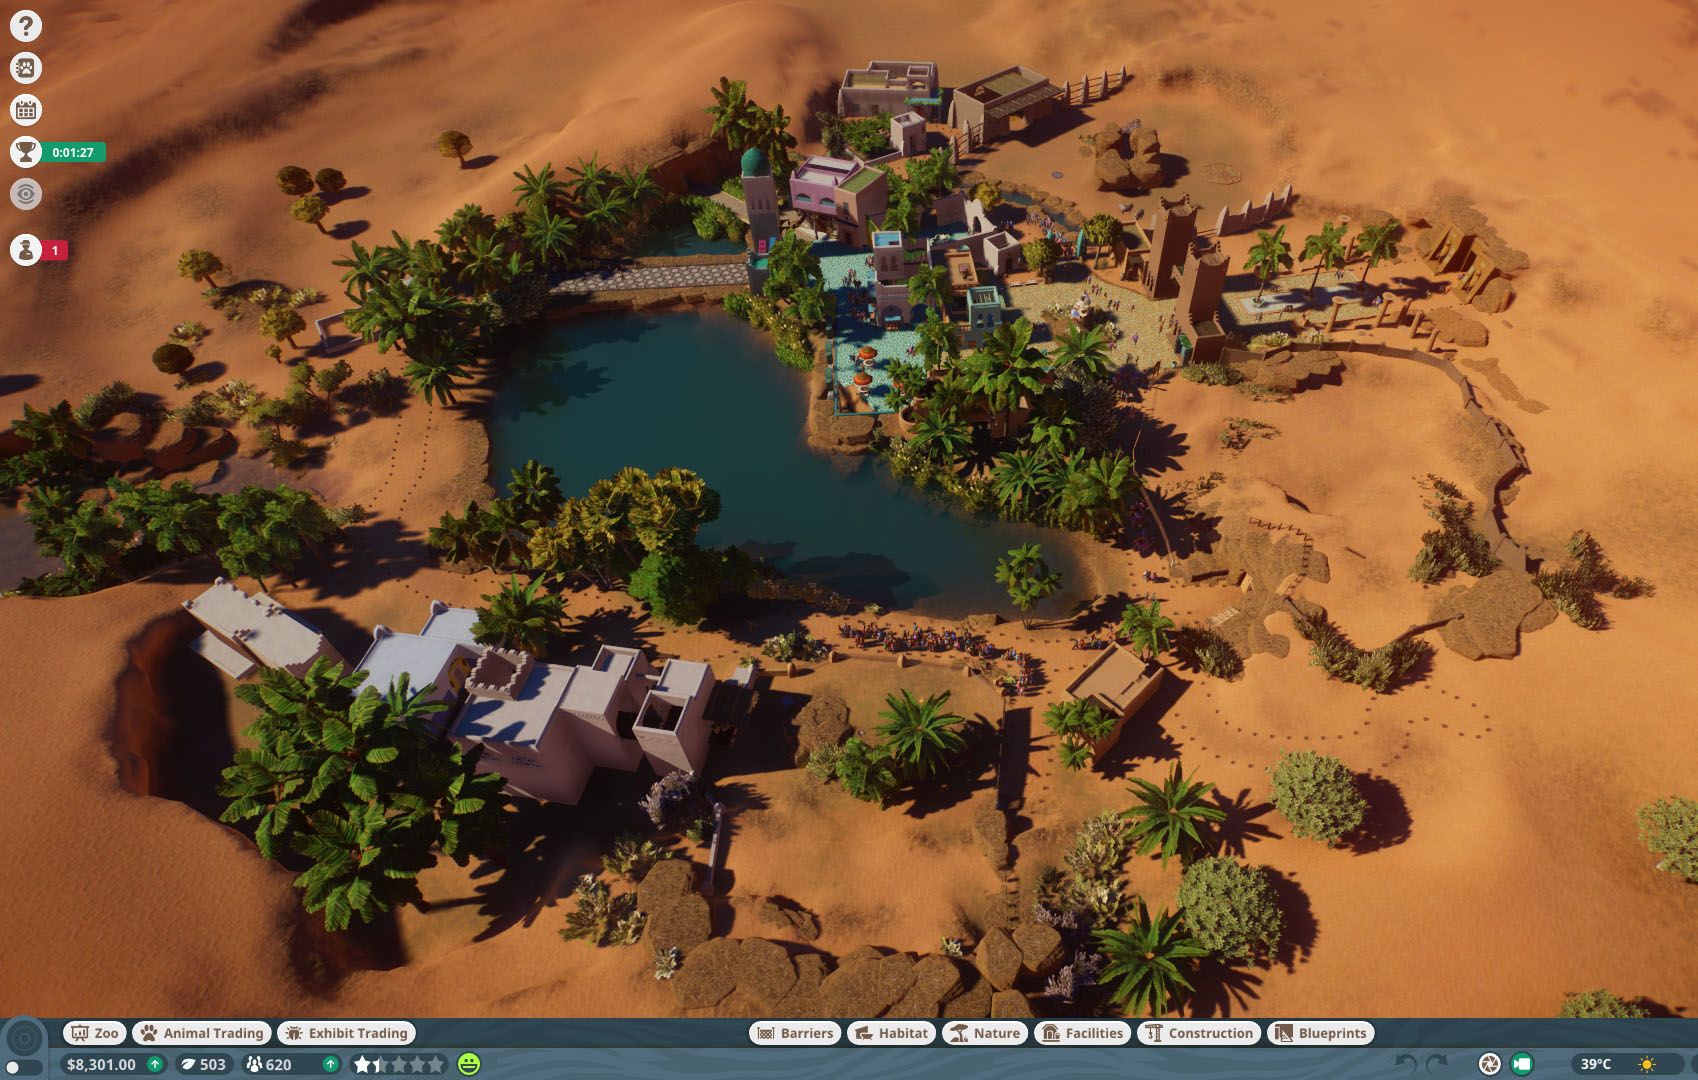 Planet Zoo How to Get All Statue rewards in Time Scenarios - Once in a Blue Dune (El Darar Bazarr) - 3CE6C37